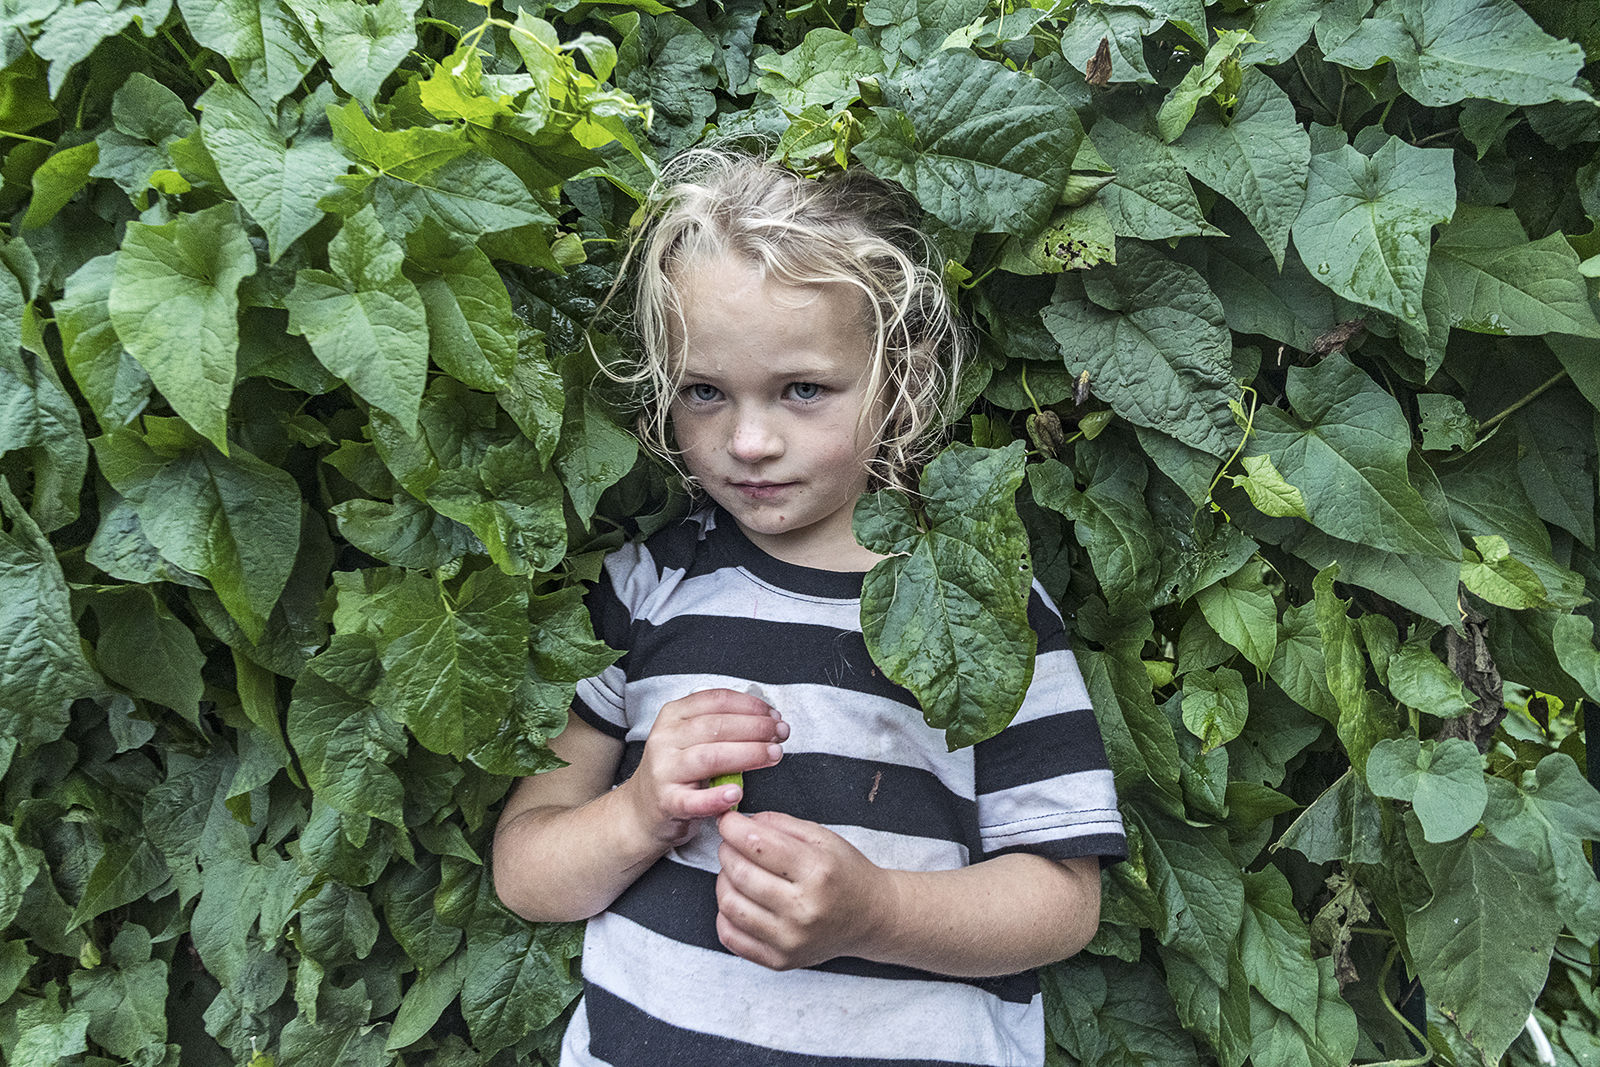 Nikita holding Bindweed Flower, Tipperary, Ireland 2019